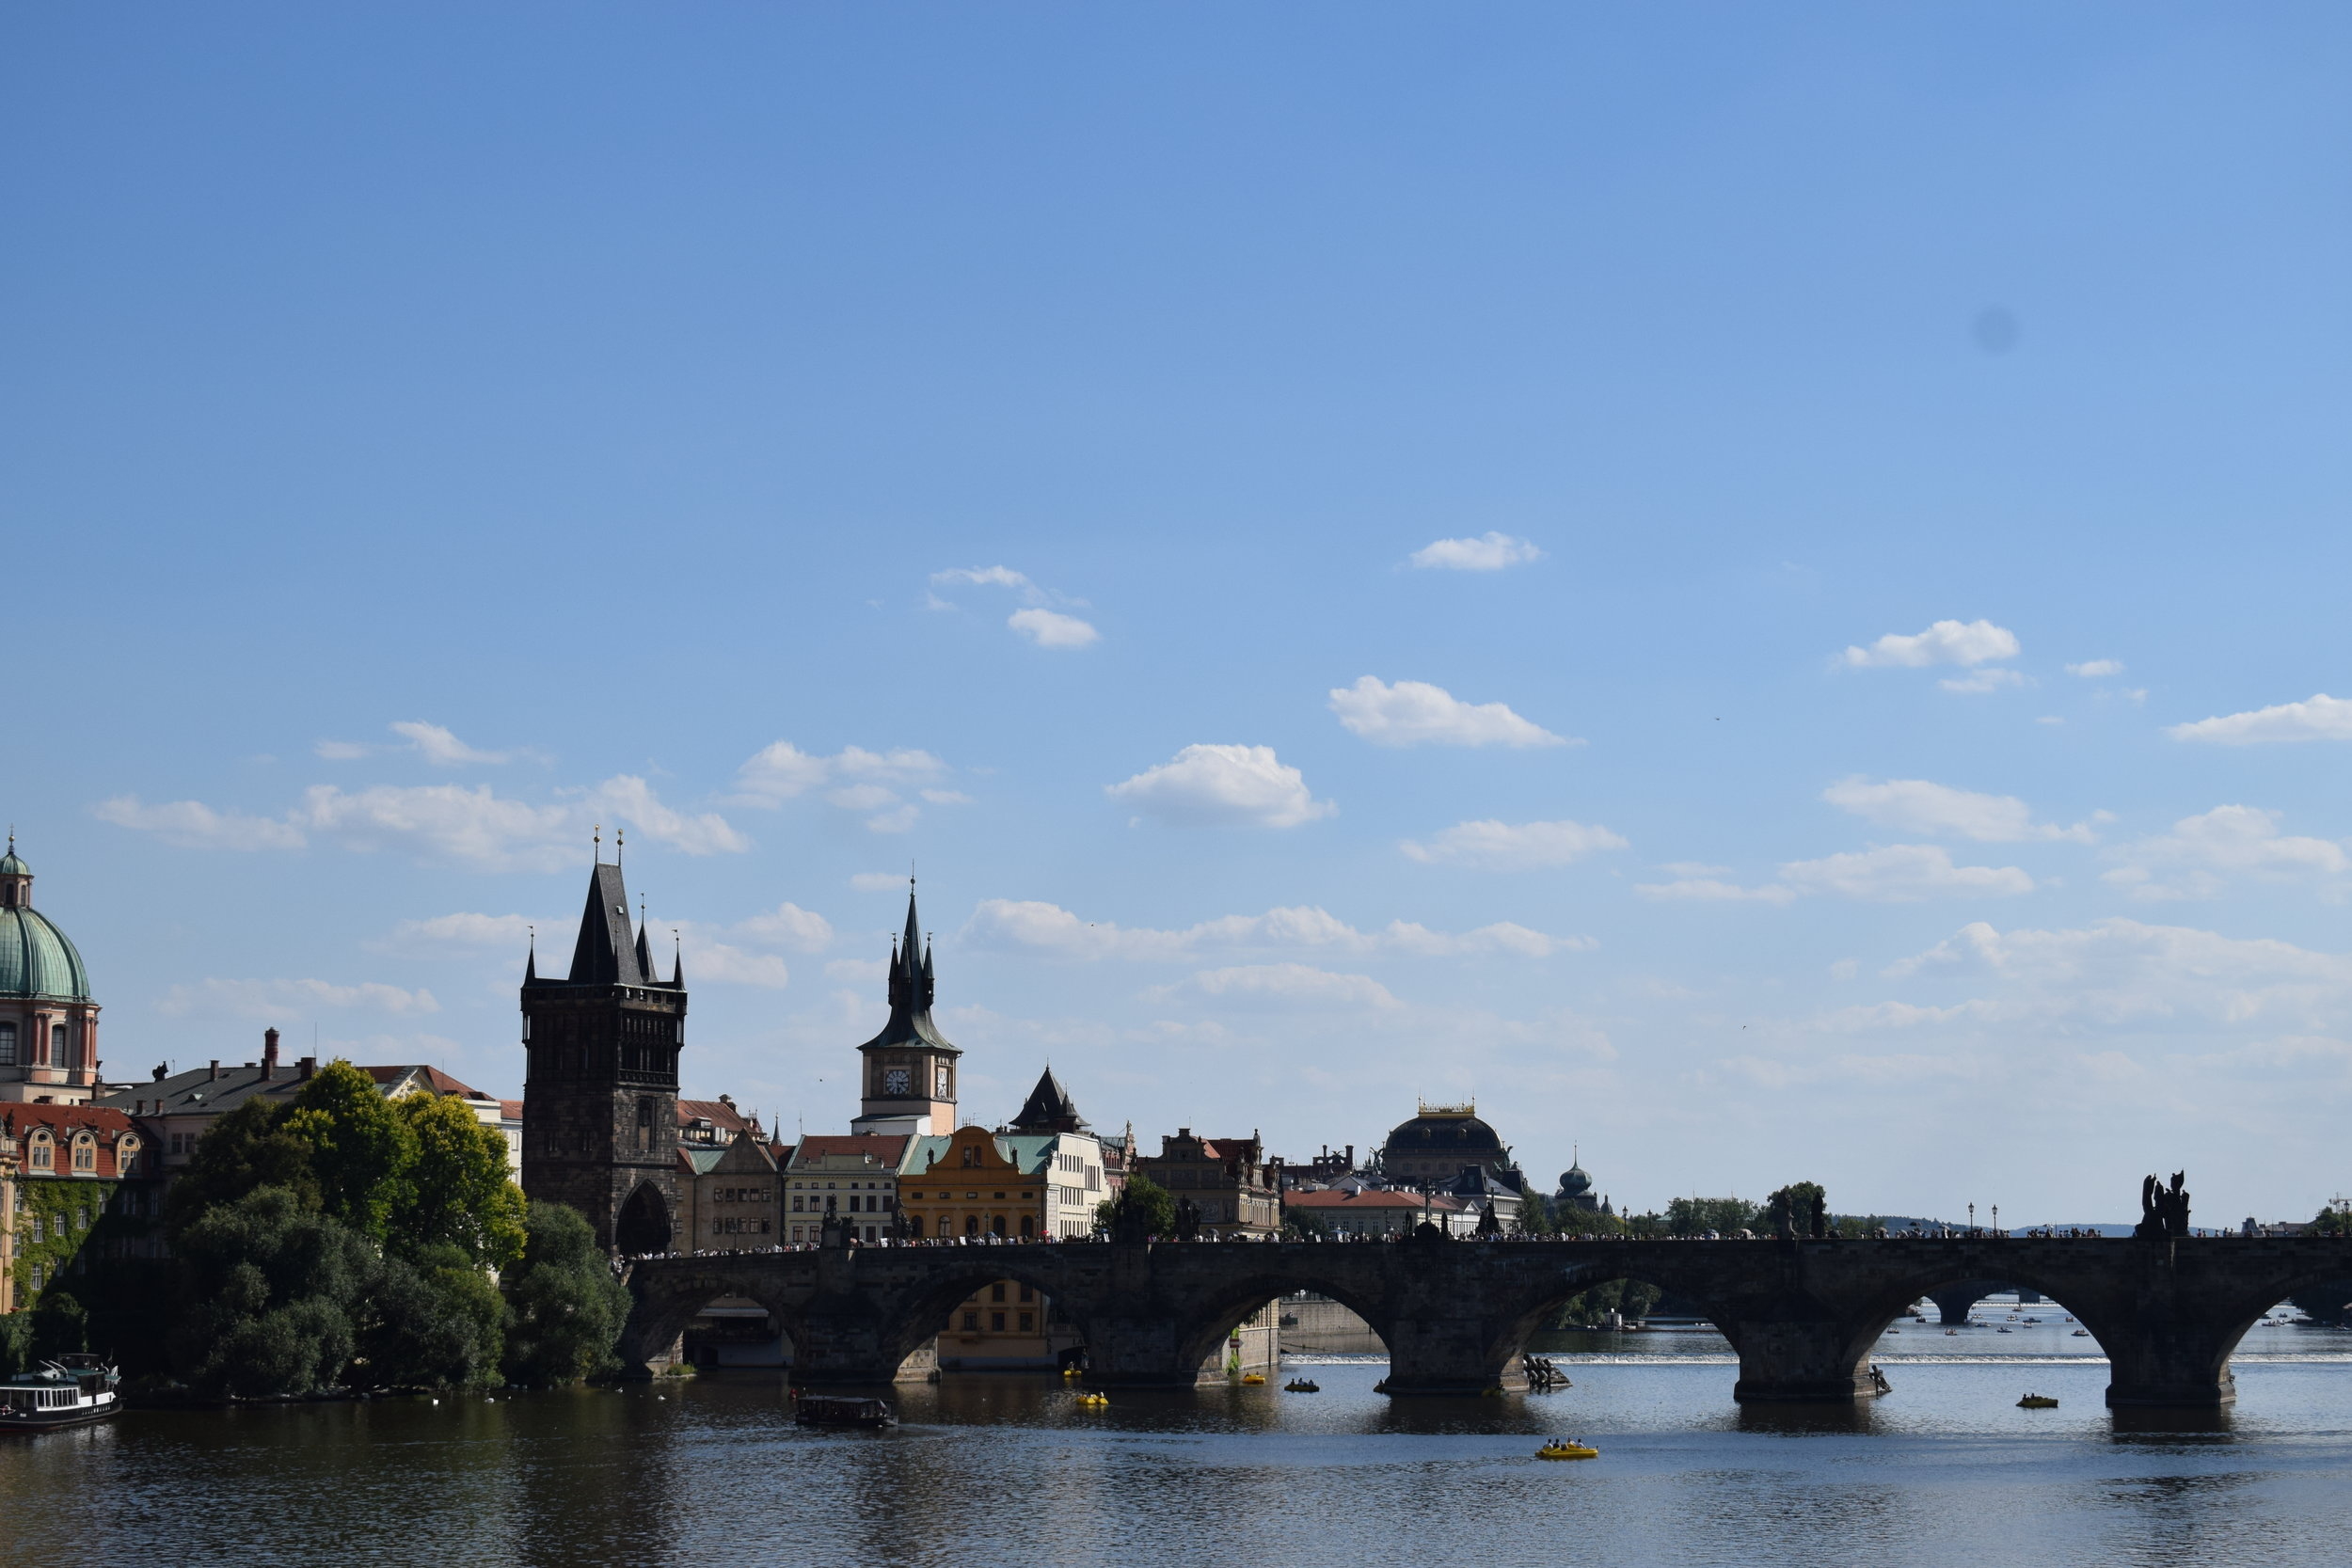 Looking back at Charles Bridge across the Vltava.